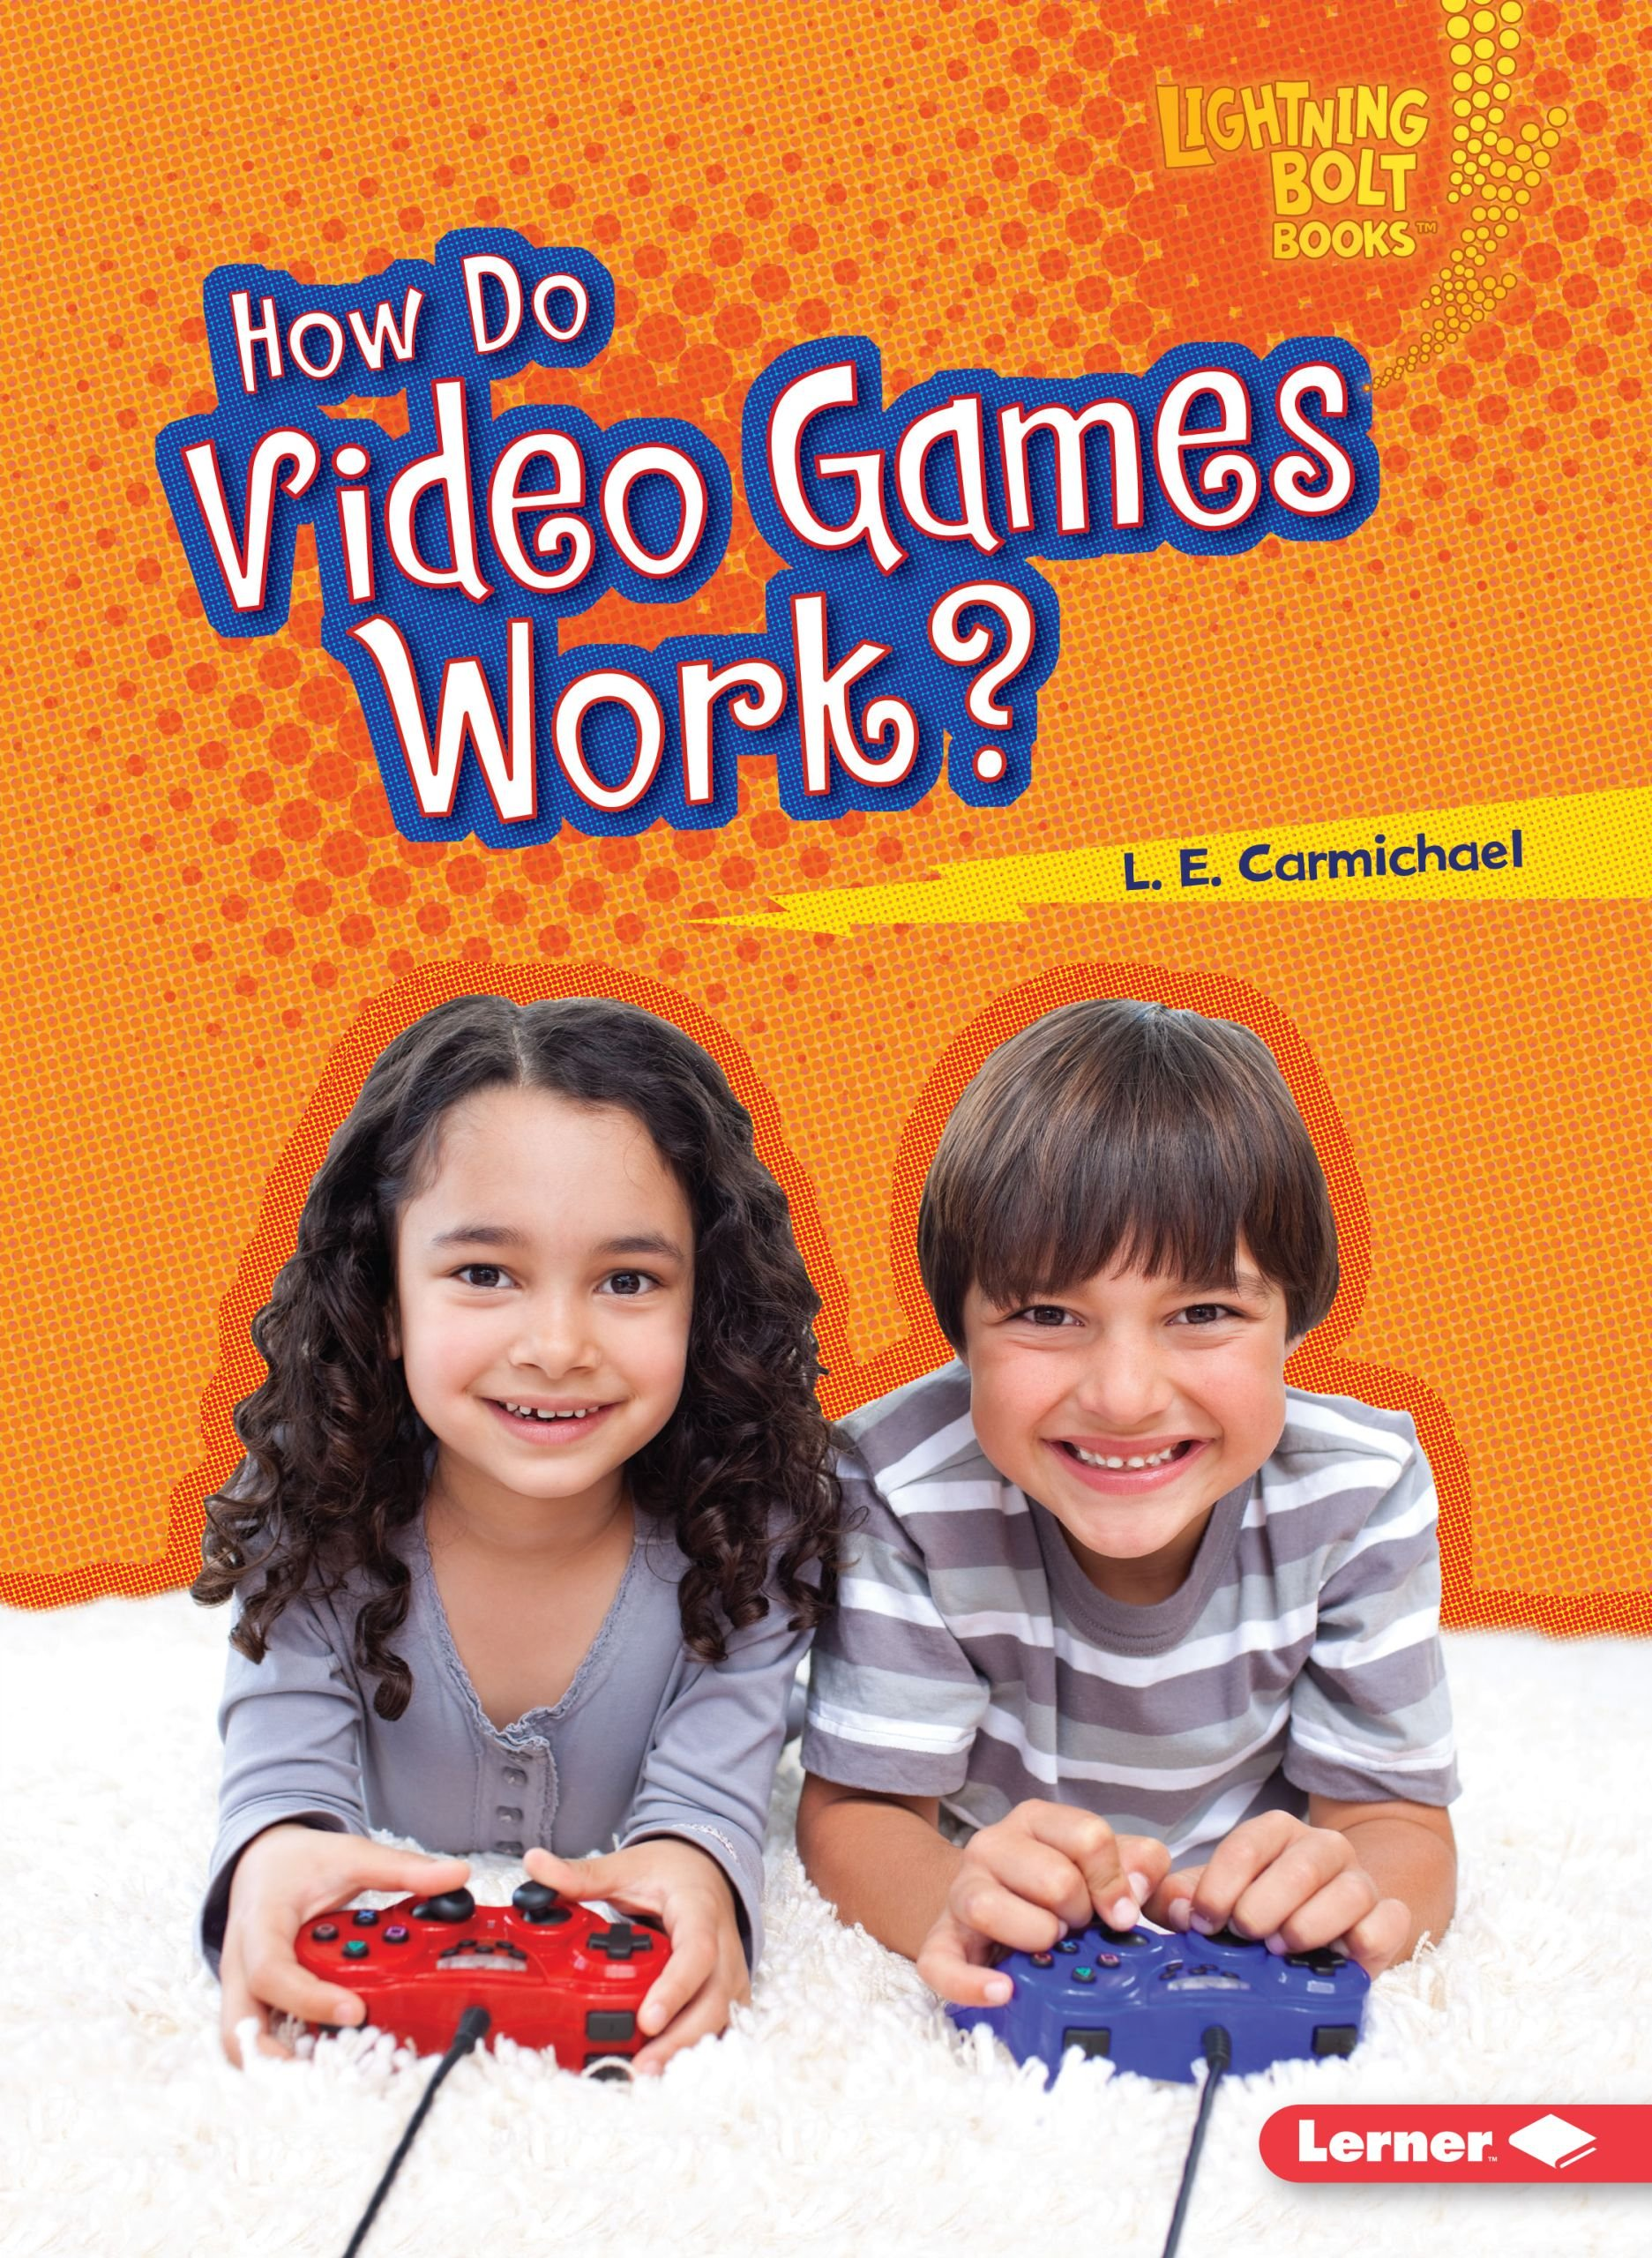 How Do Video Games Work? (Lightning Bolt Books: Our Digital World)